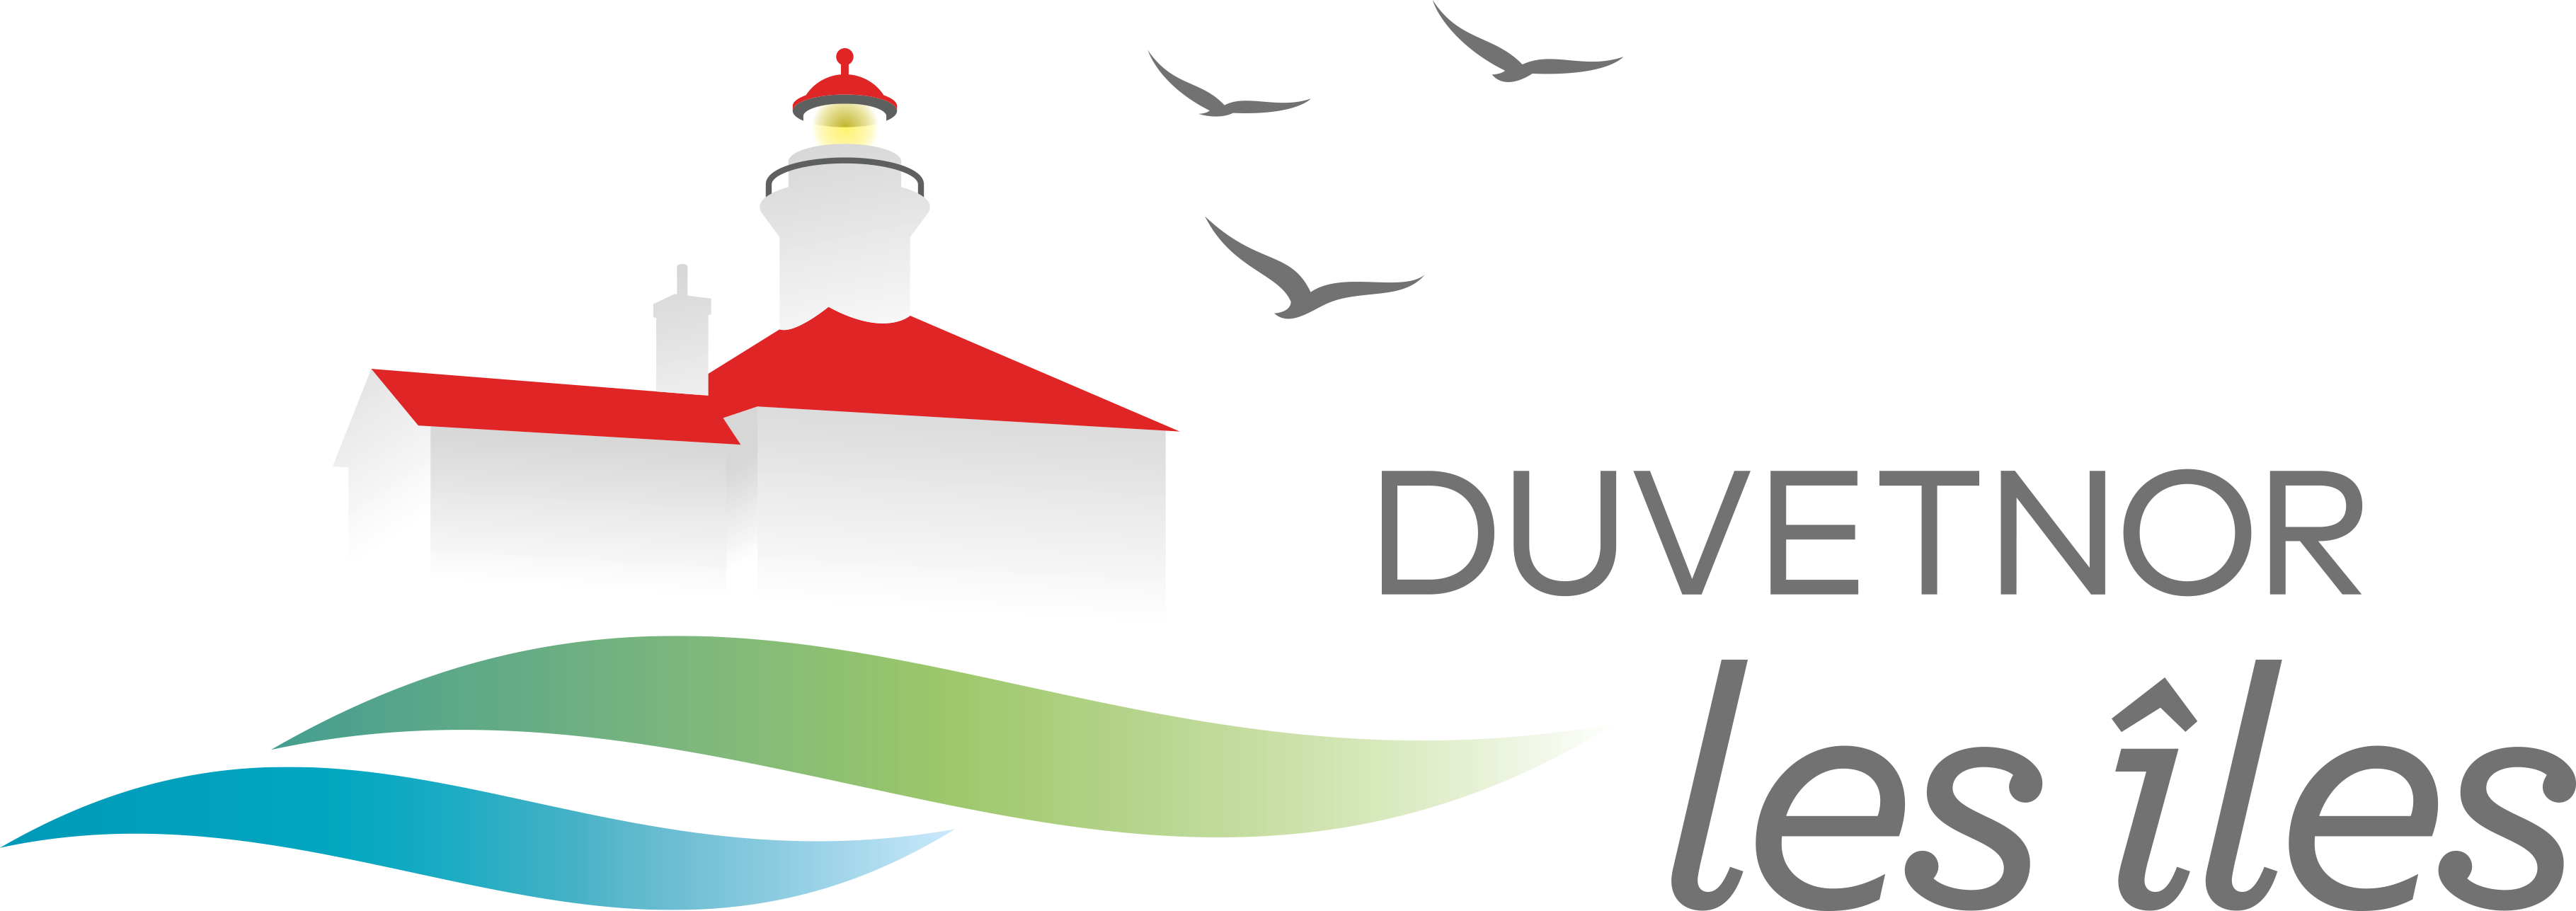 Logo Duvetnor les iles